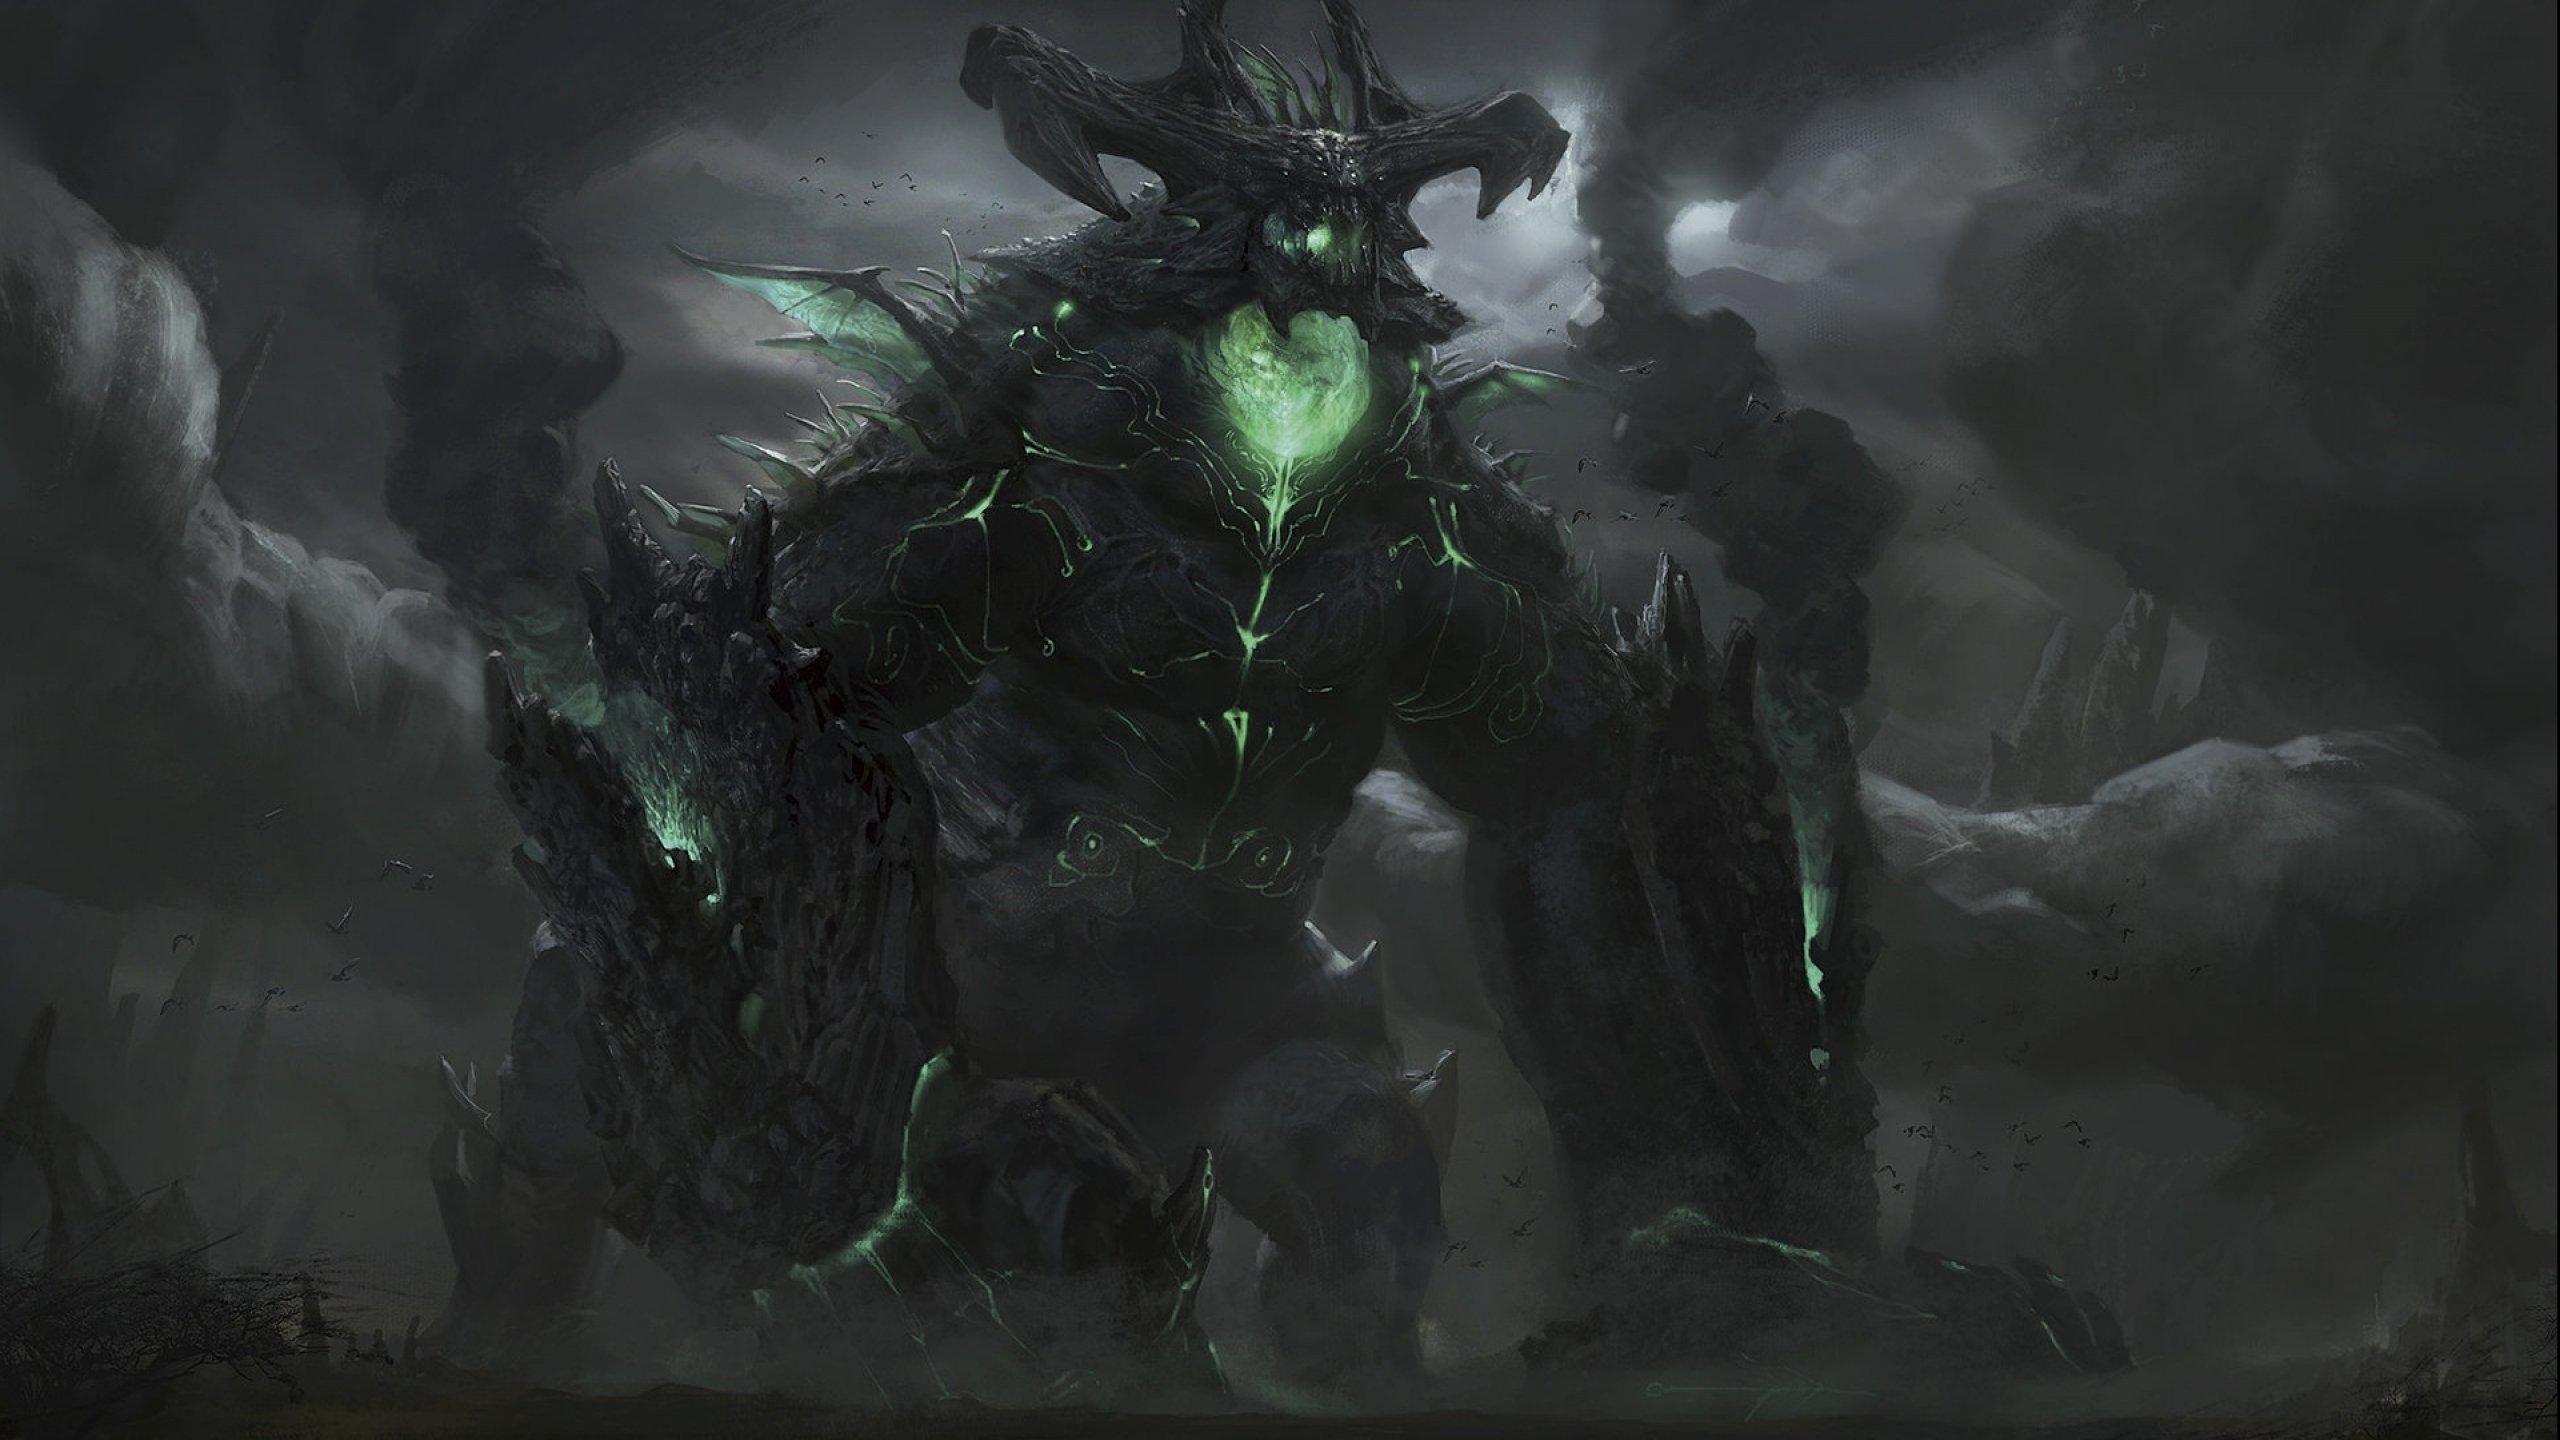 Space Demonic Art Hd Wallpaper: Fantasy Demon Dark Art Artwork Wallpaper